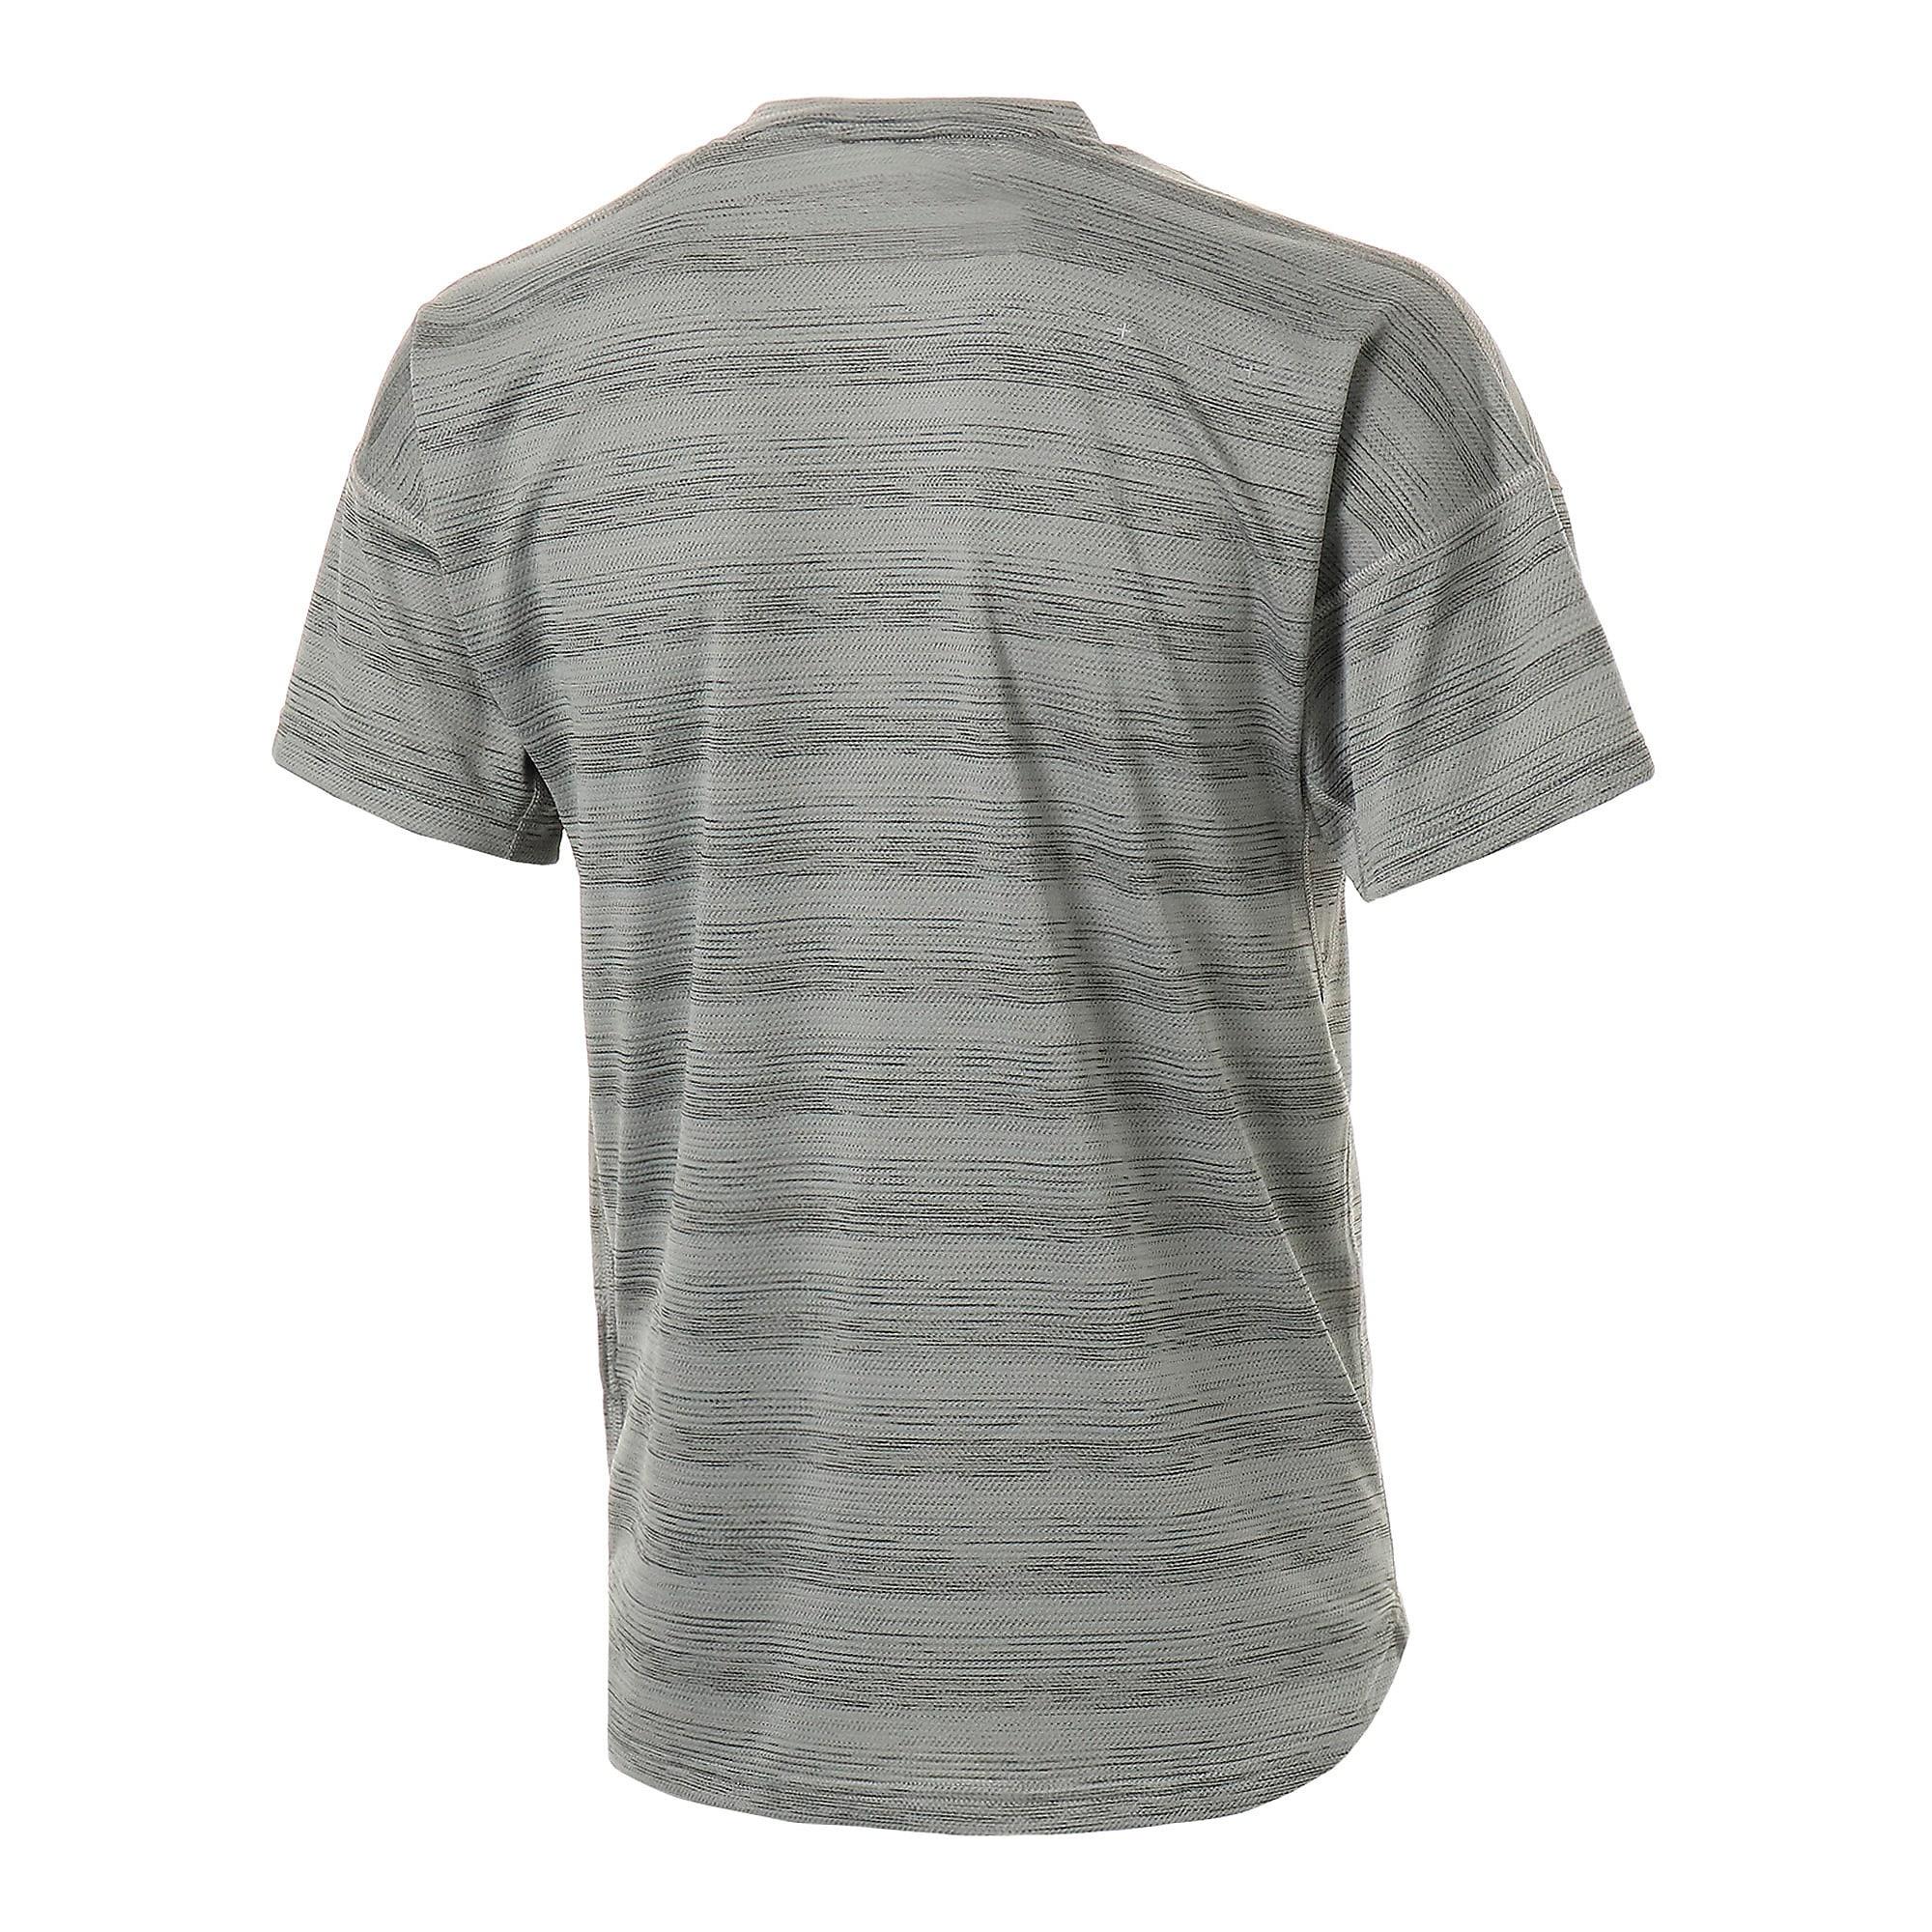 Thumbnail 6 of LAST LAP ヘザー SS ランニング Tシャツ 半袖, Medium Gray Heather, medium-JPN